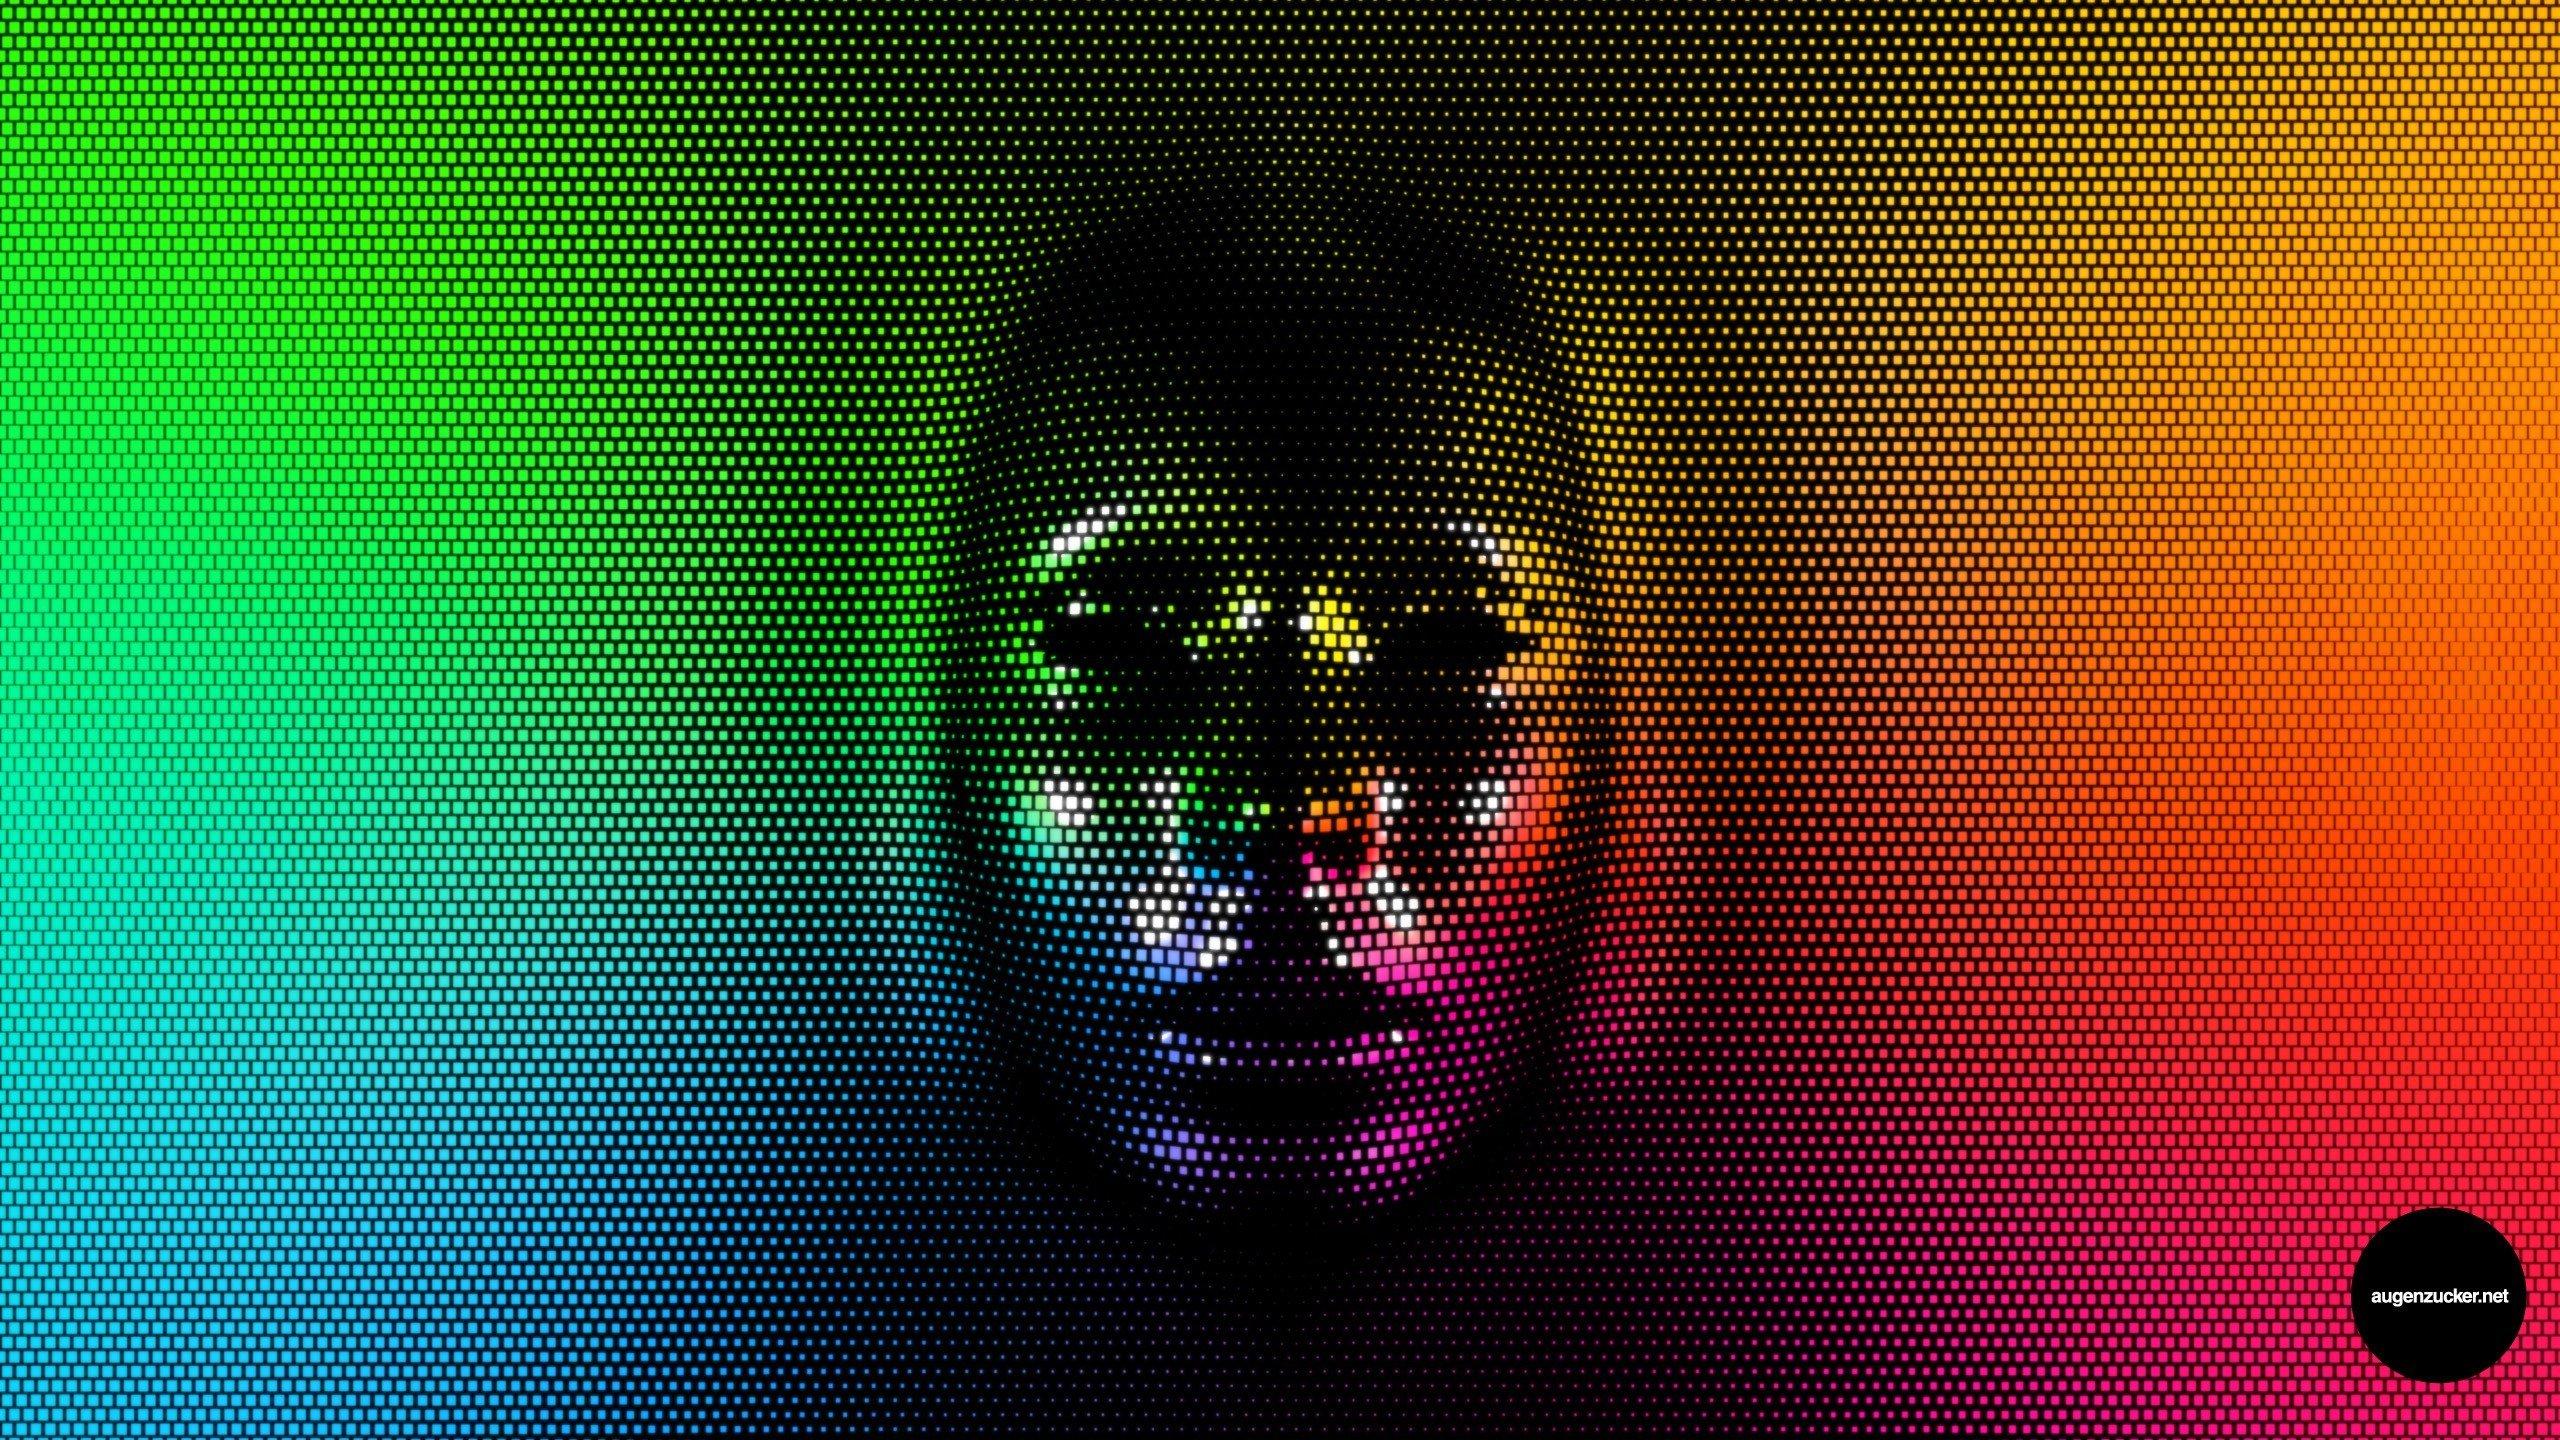 Wallpaper 2560x1440 Px Face Pixels Rainbow Colors